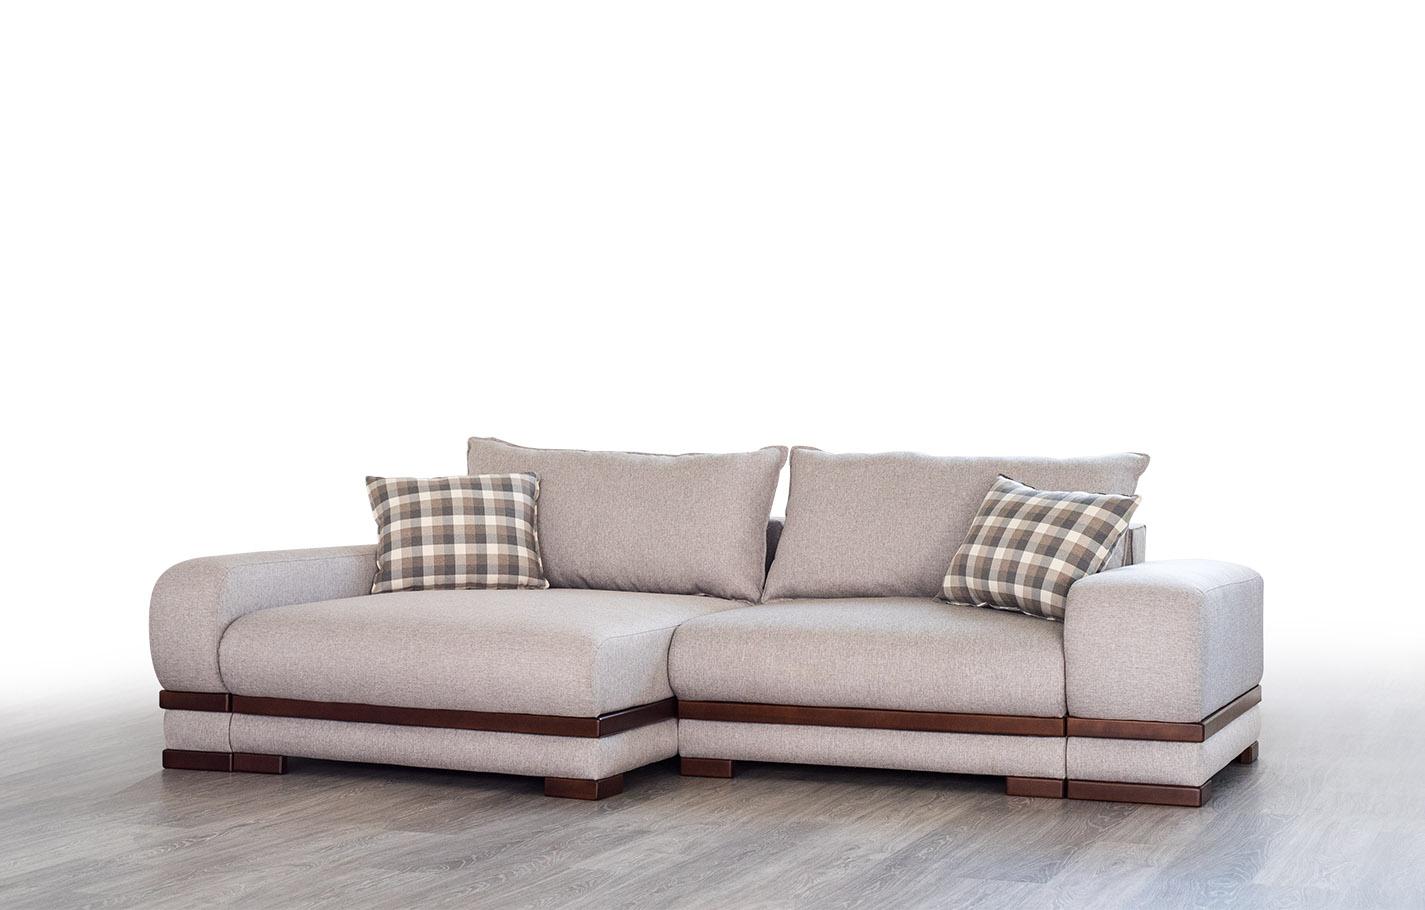 sofa_corner_komfort-2_7